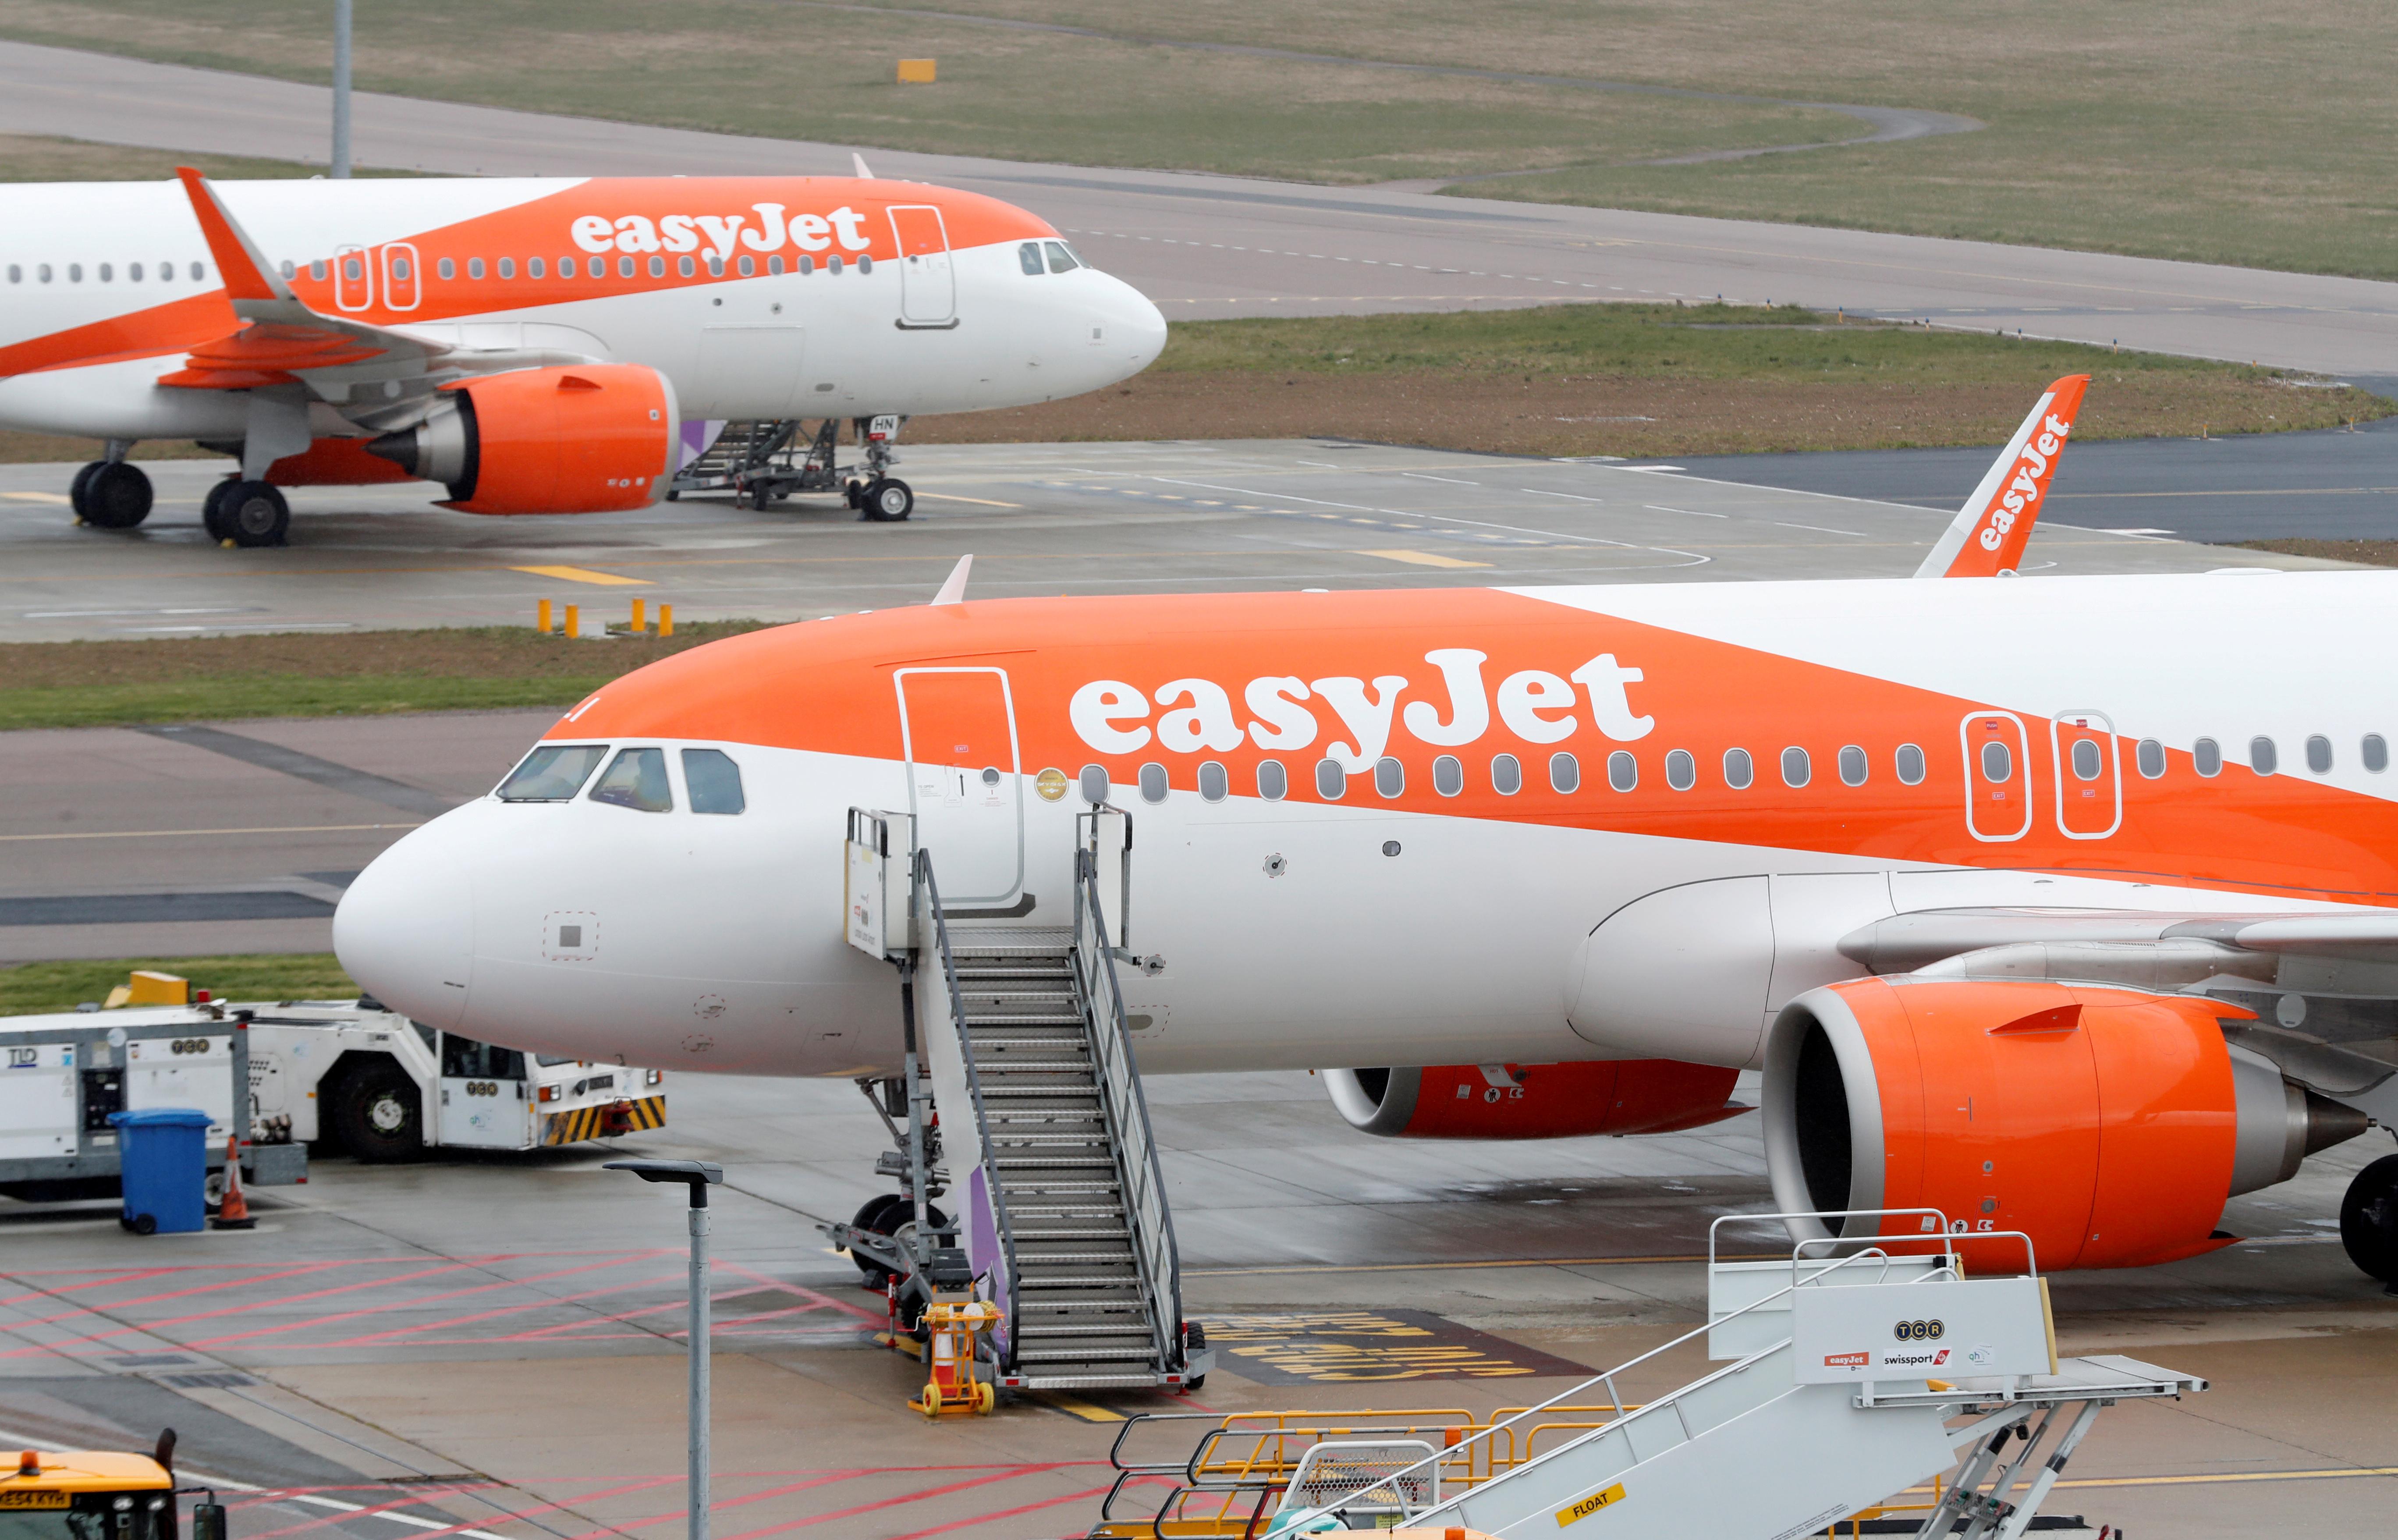 EasyJet plans to cut 30% of workforce